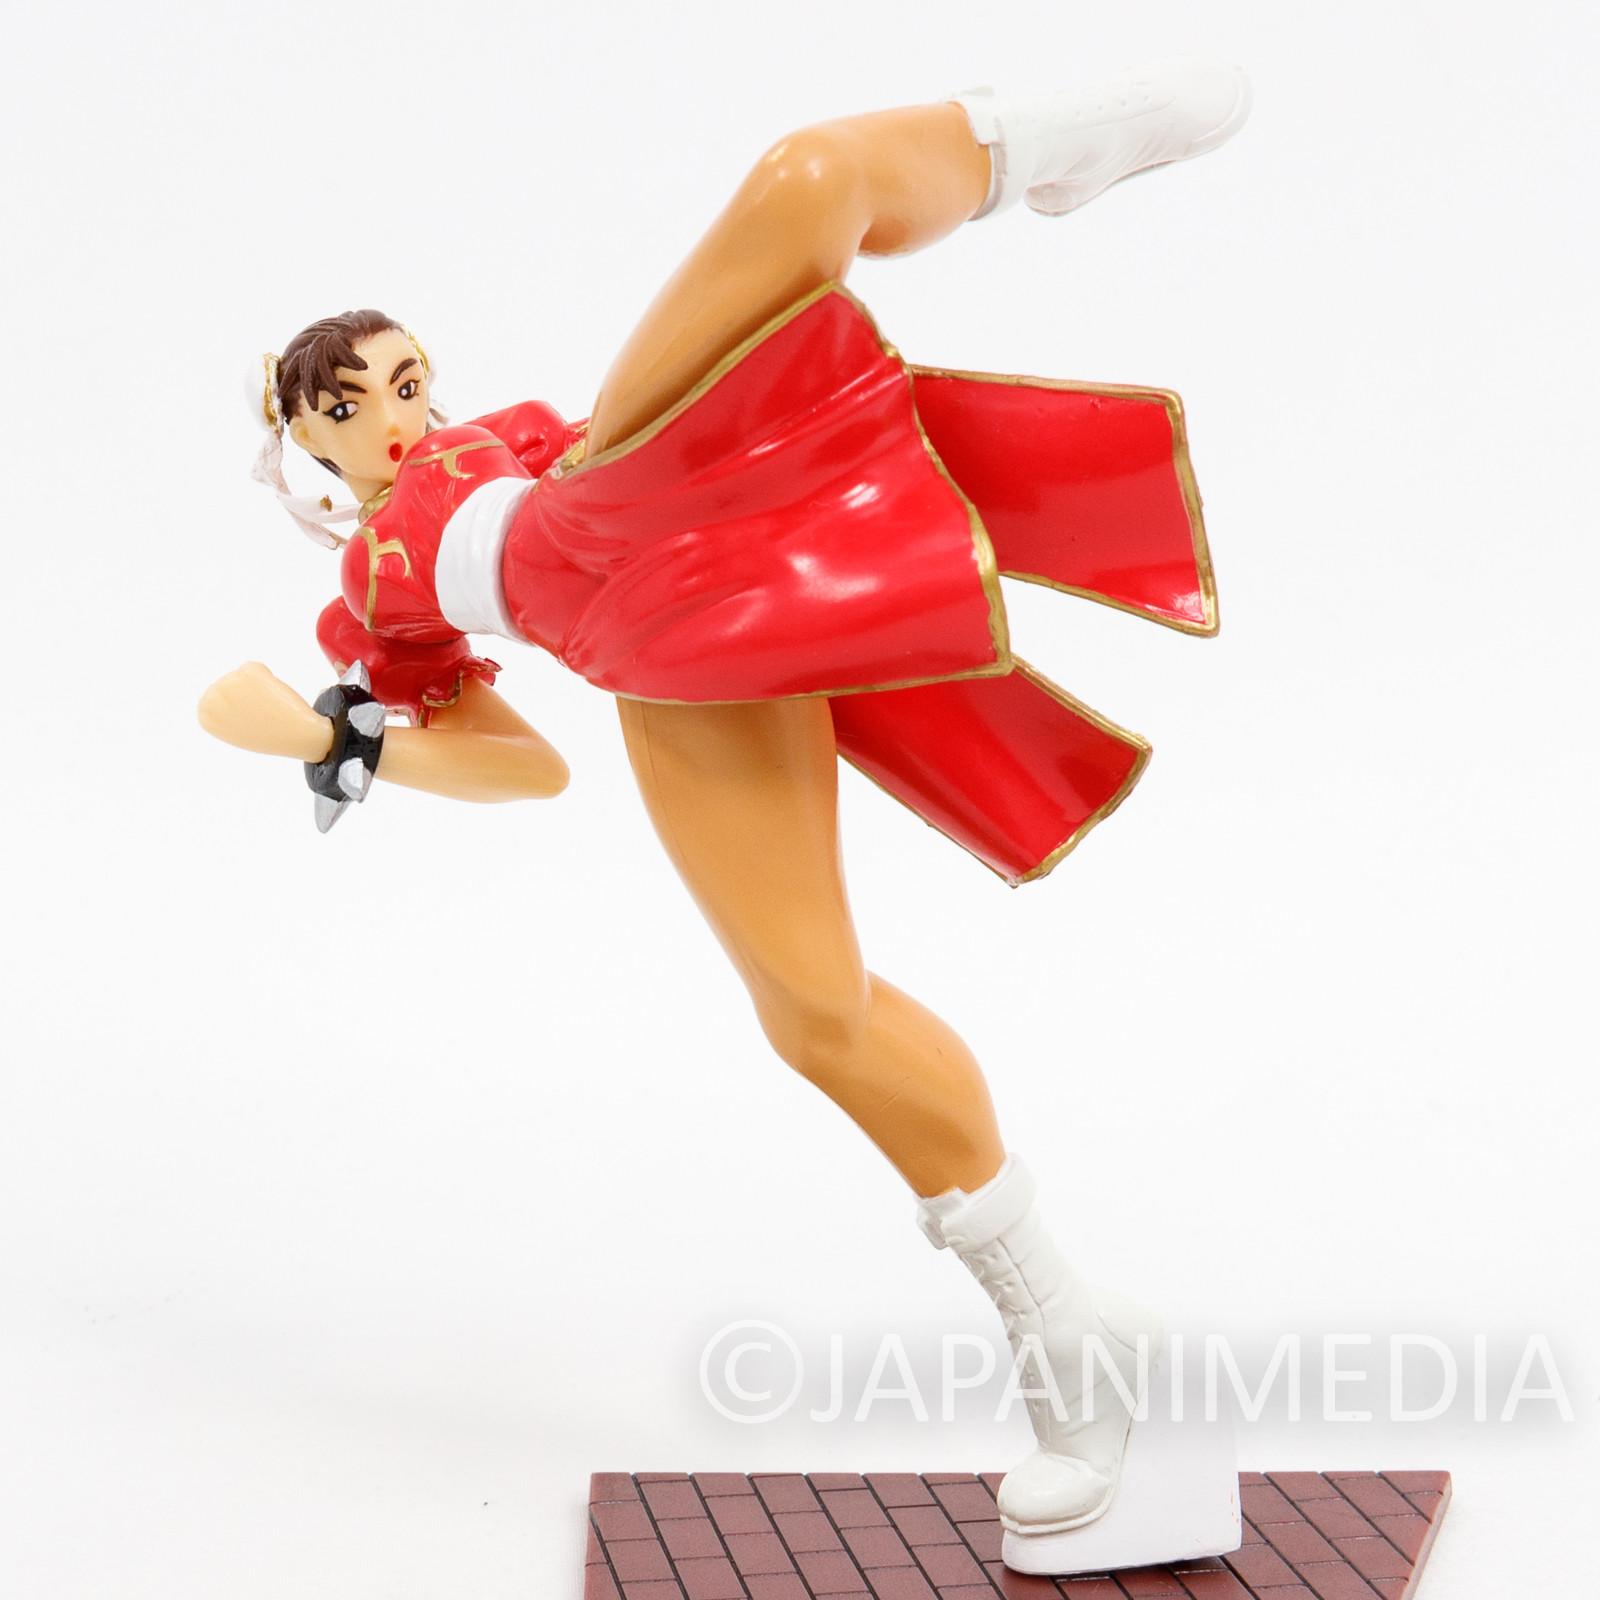 Street Fighter 2 Chun-Li Pink Kick ver Capcom Figure Collection JAPAN GAME